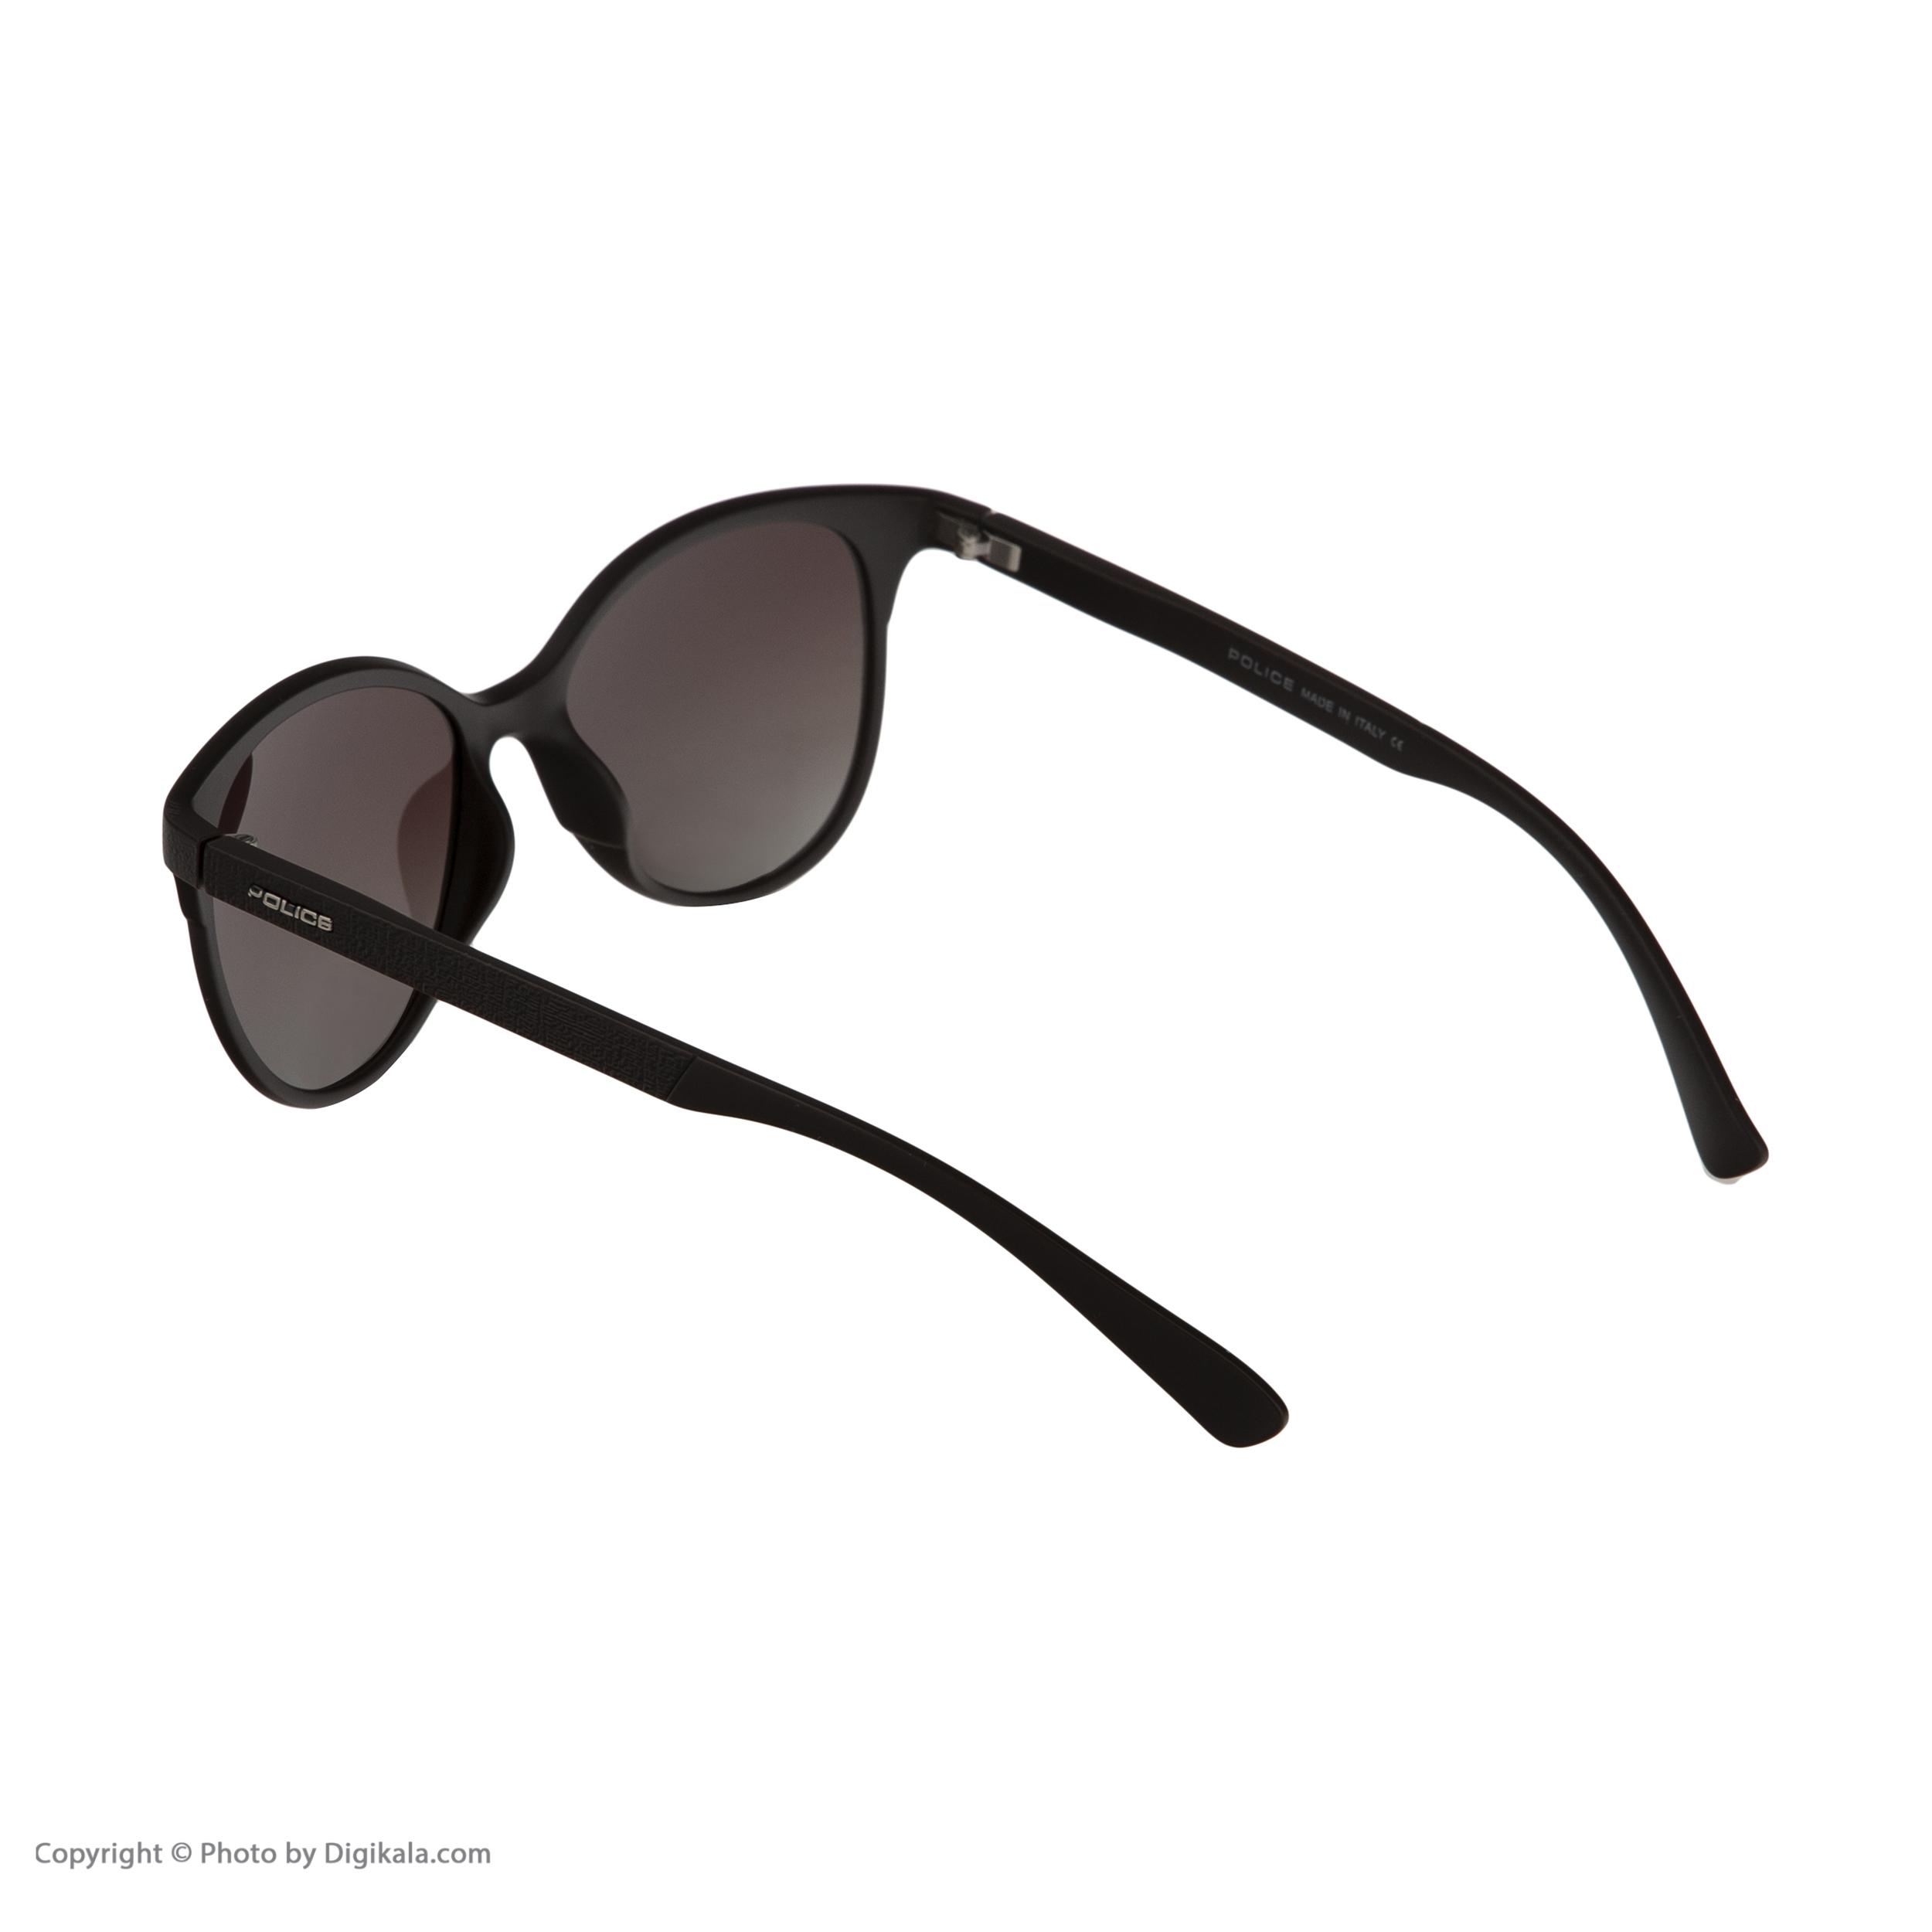 عینک آفتابی پلیس کد 187